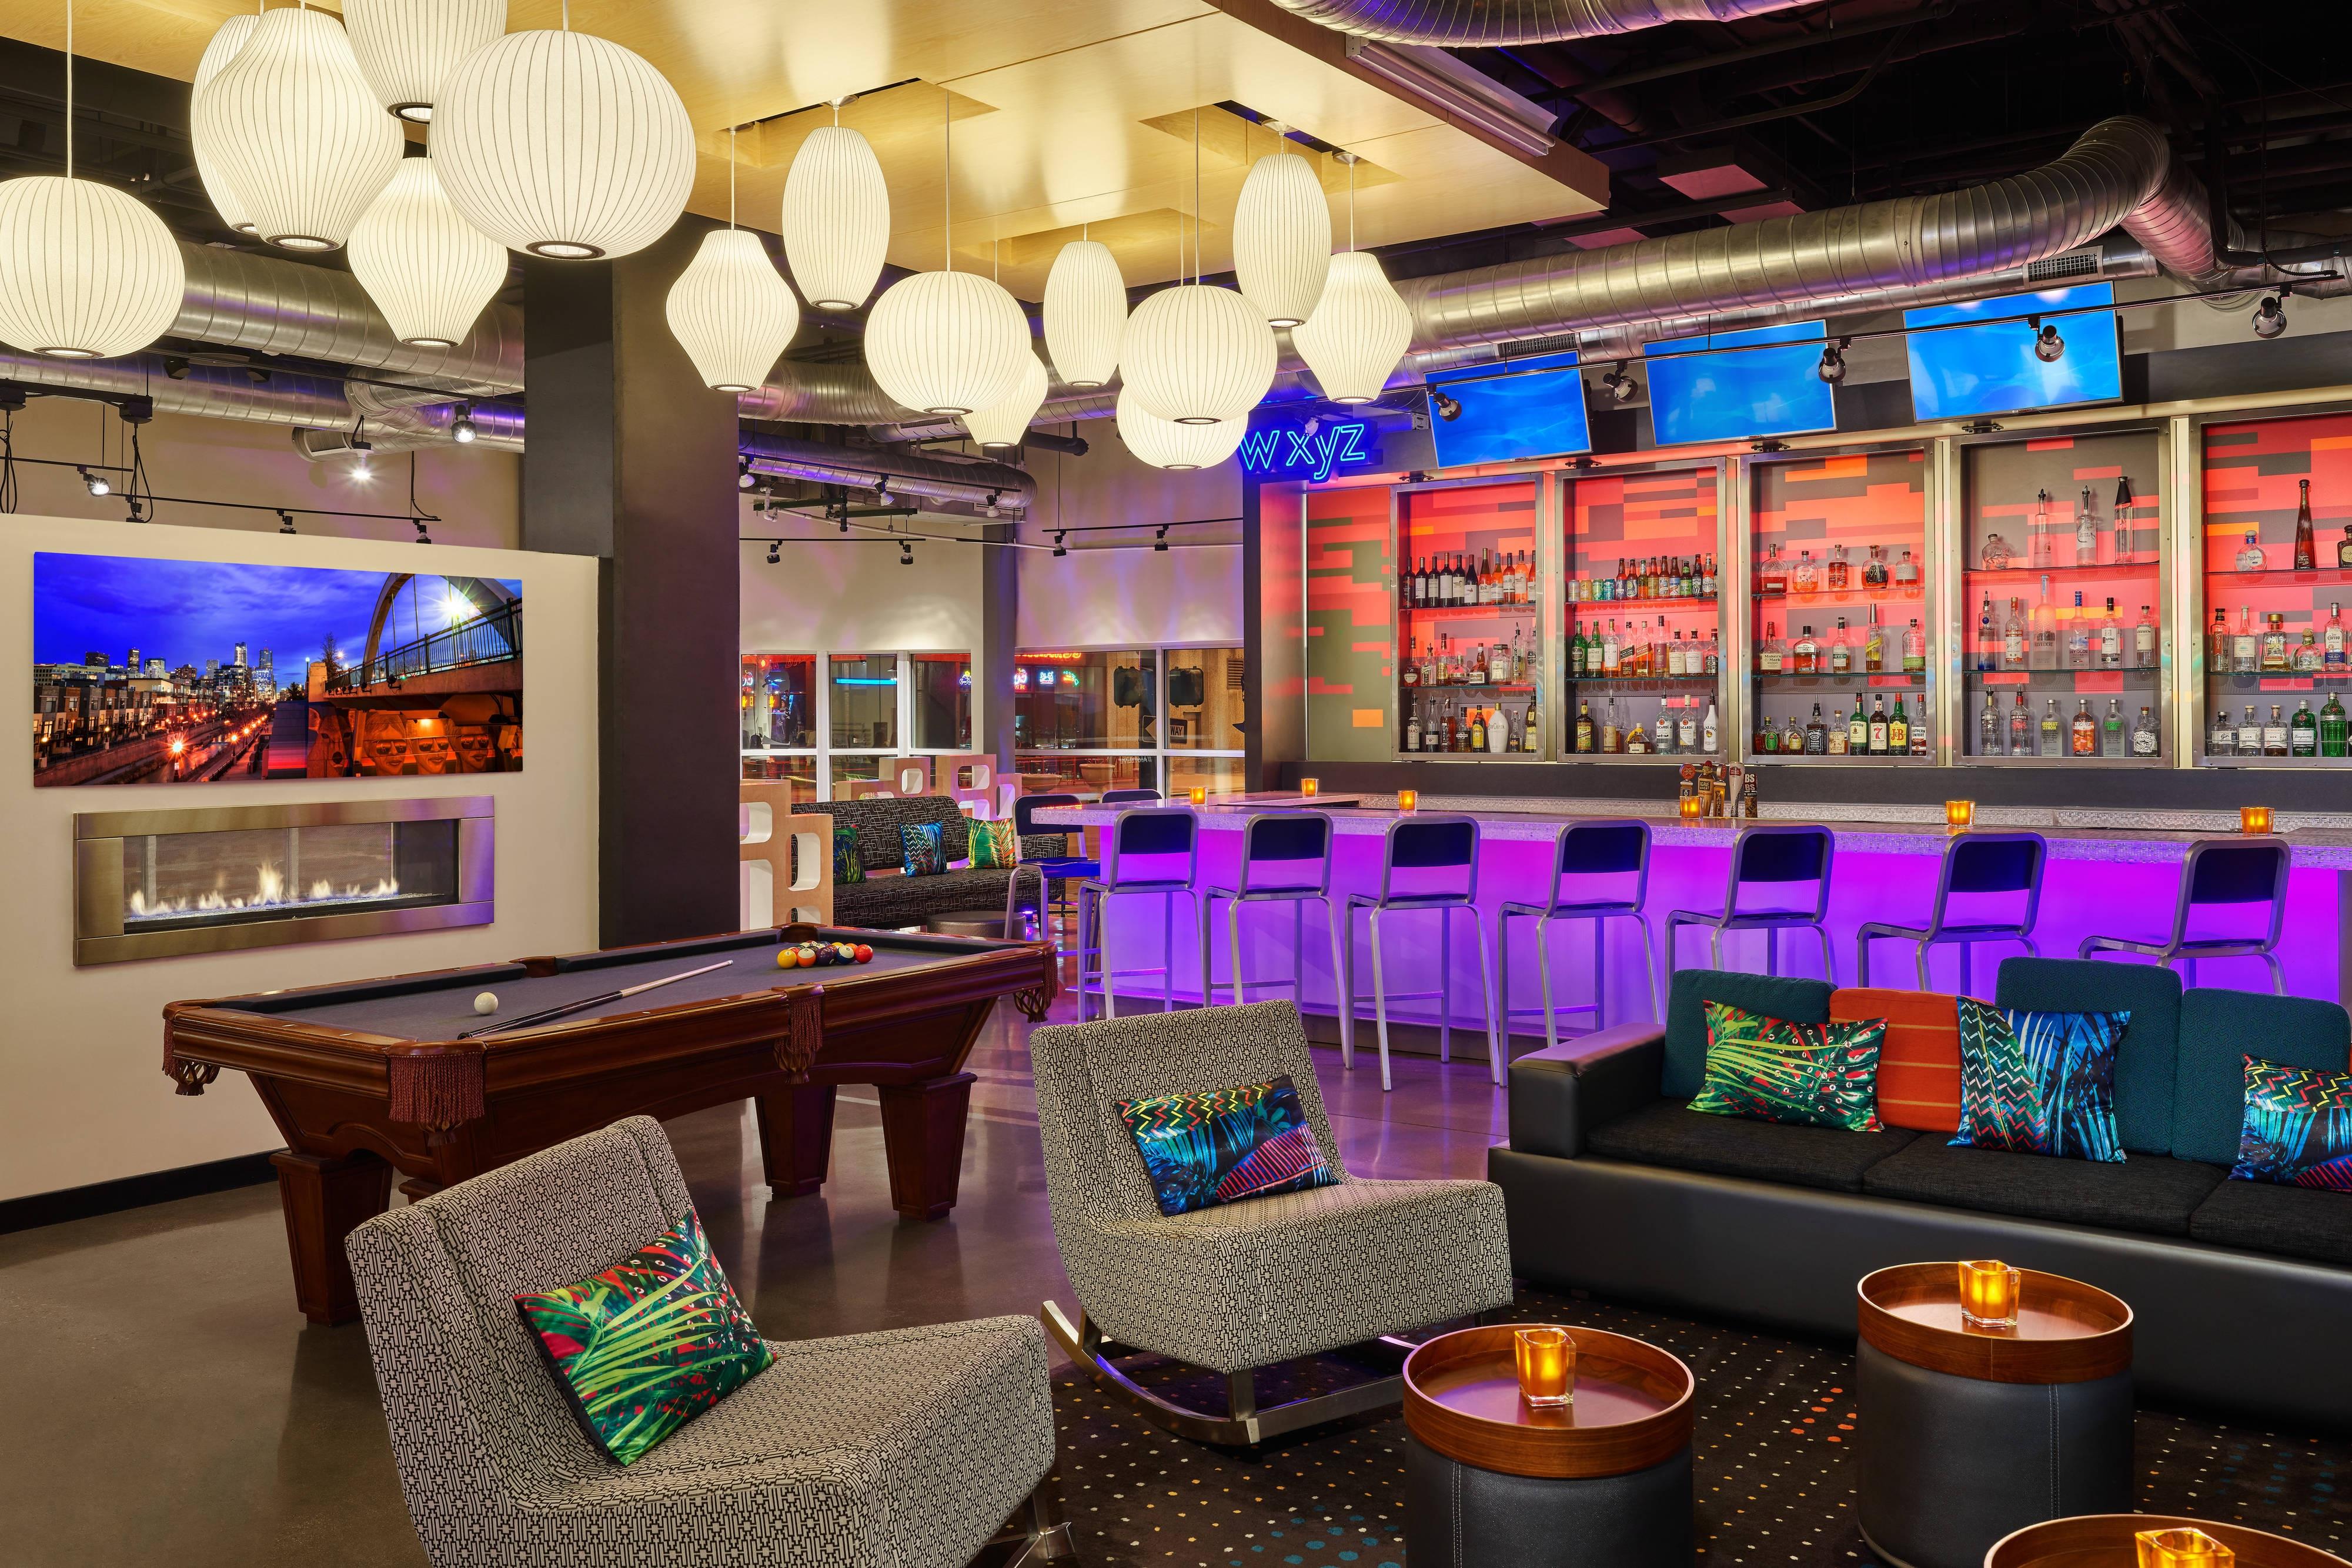 WXYZ Lounge and Bar